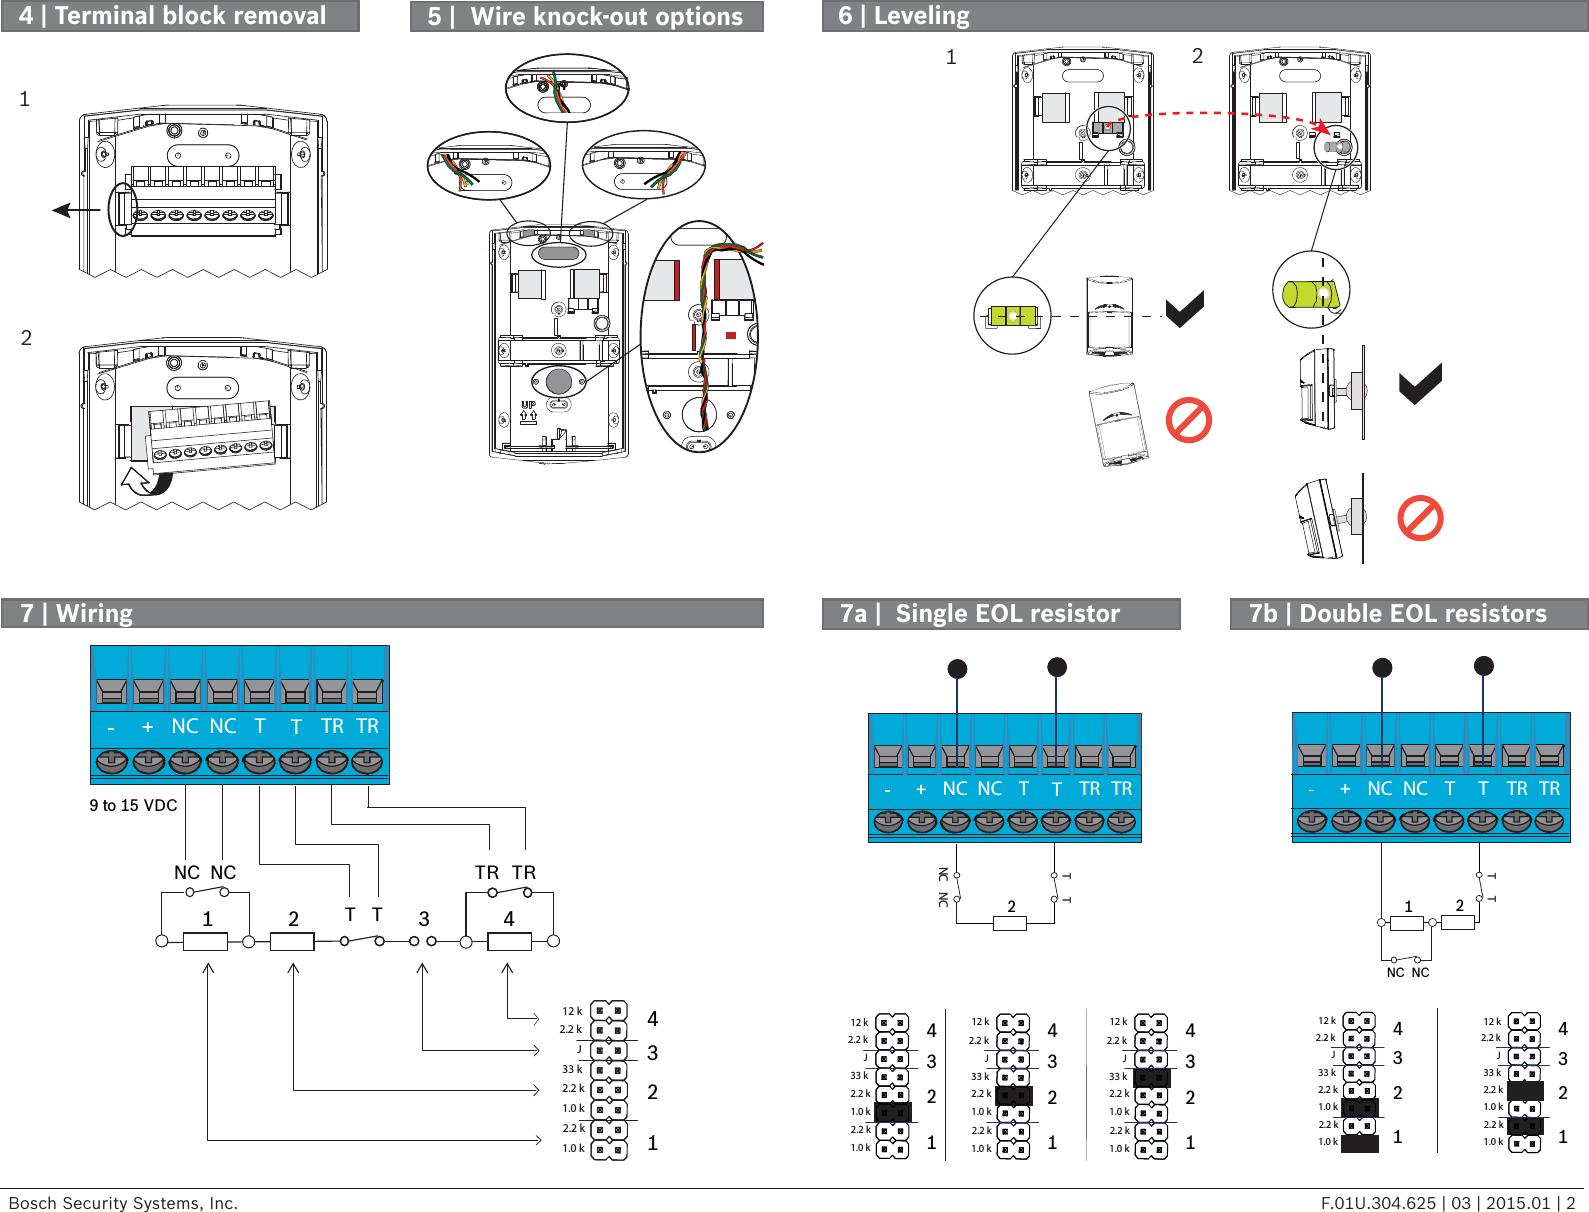 Bosch Motion Sensor Wiring Diagram - Mallory Voltmaster Wiring Diagram -  pipiiing-layout.nescafe.jeanjaures37.frWiring Diagram Resource